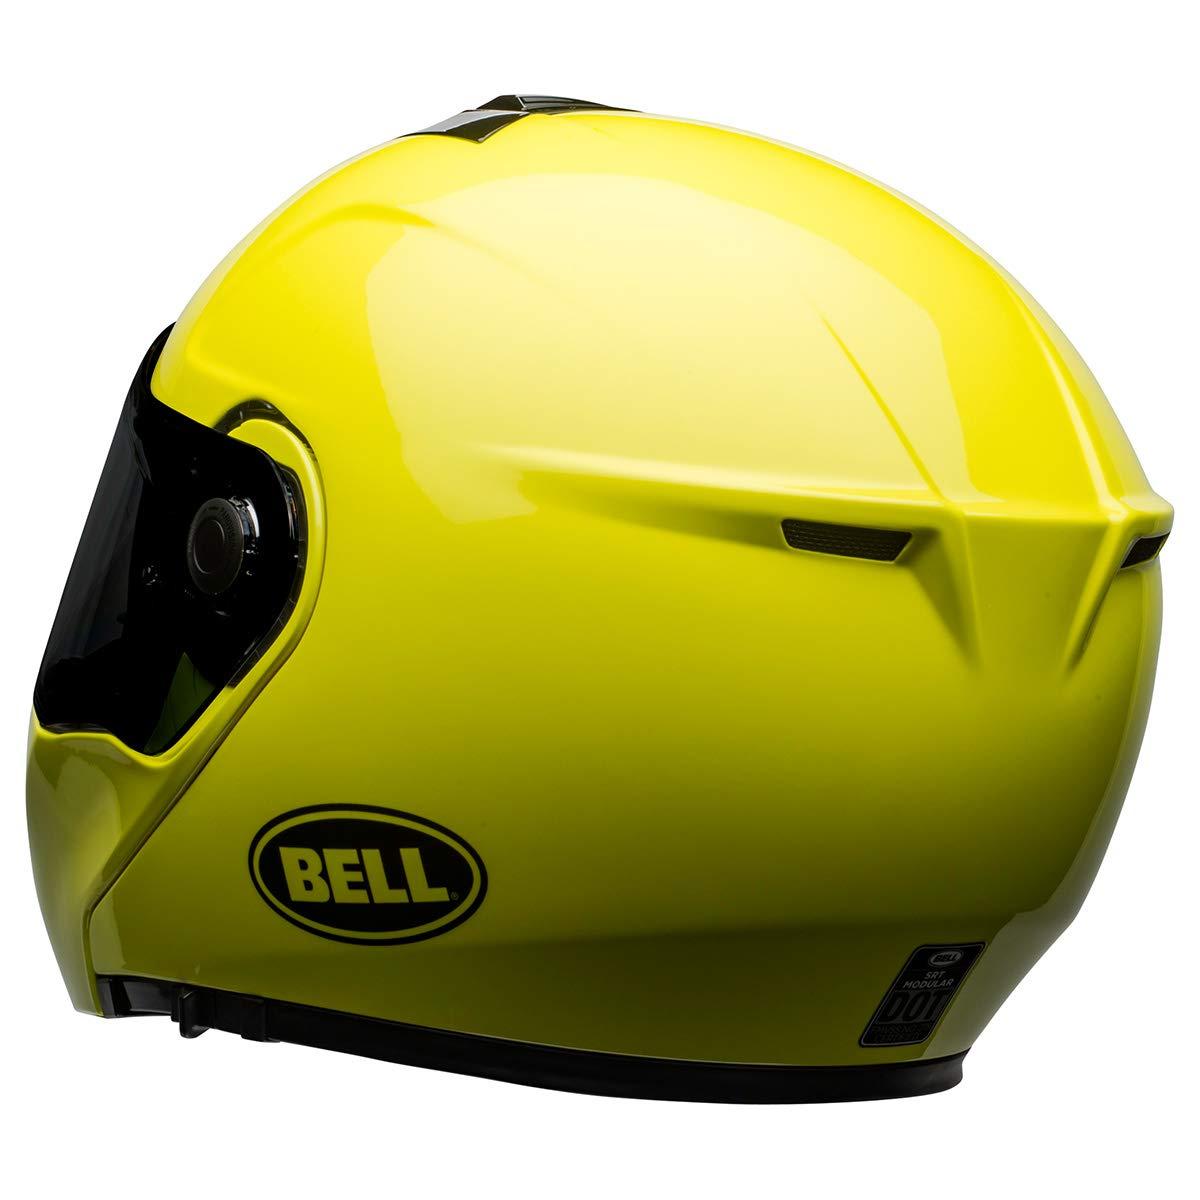 Transmit Gloss Hi-Viz, X-Large Bell SRT Modular Street Motorcycle Helmet